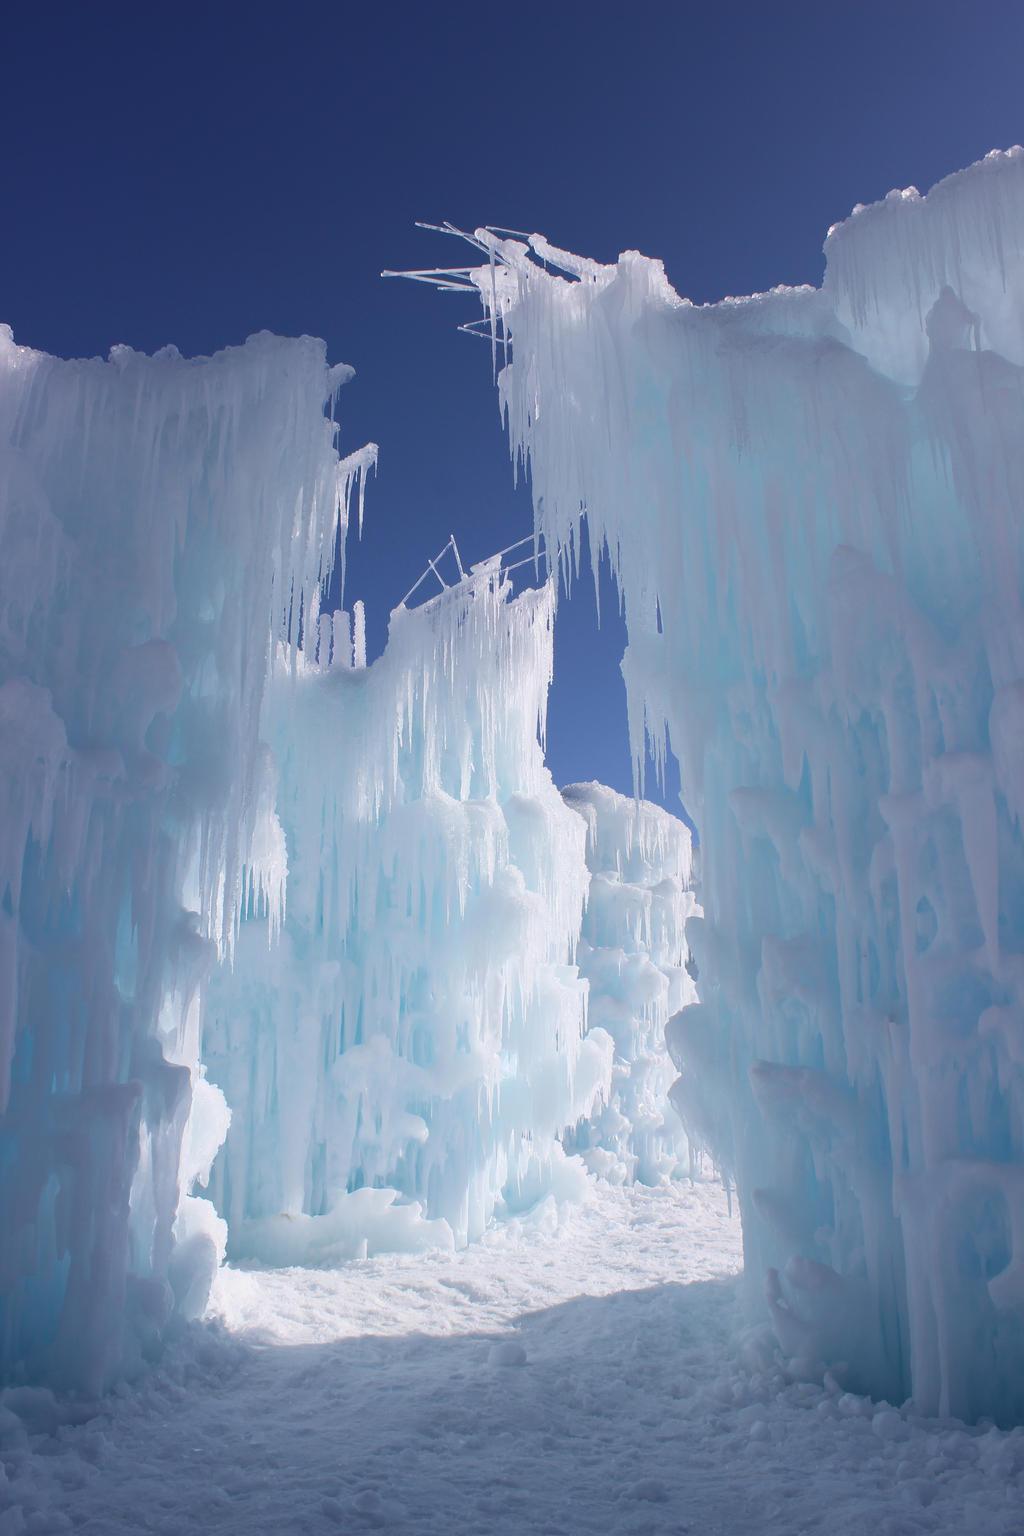 Winter Scenes - Ice Castle2 by Qrinta